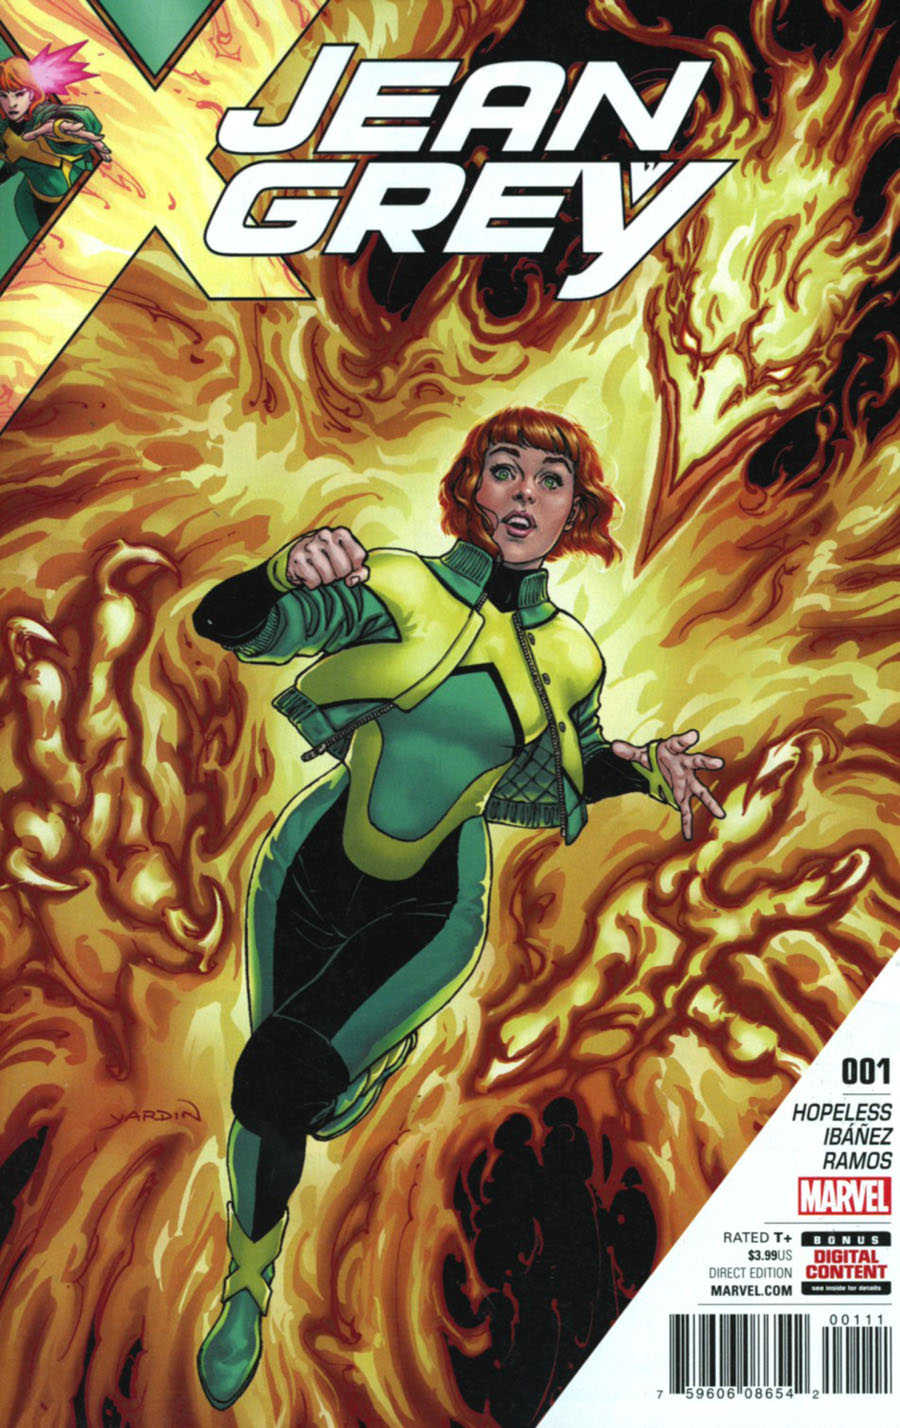 Jean Grey #1 Cover A Regular David Yardin Cover (Resurrxion Tie-In)